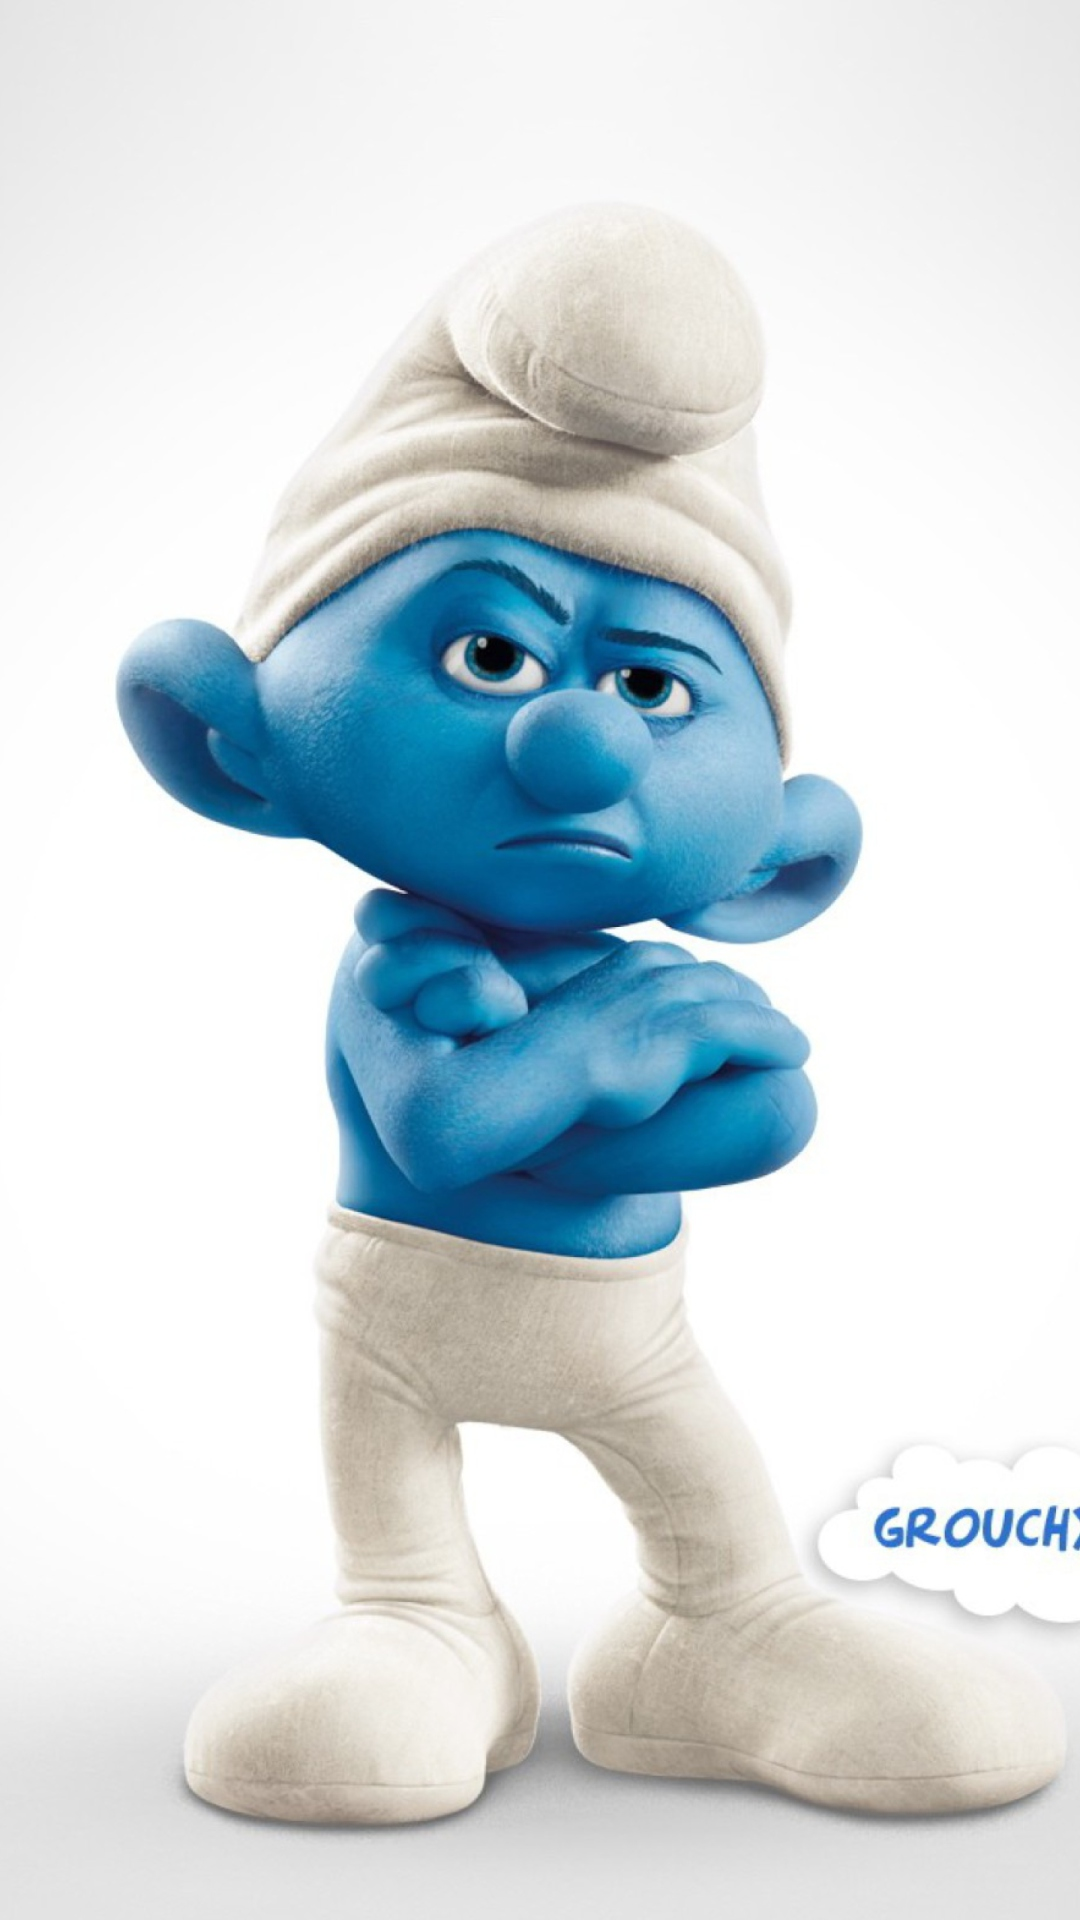 Grouchy Smurf Wallpape...